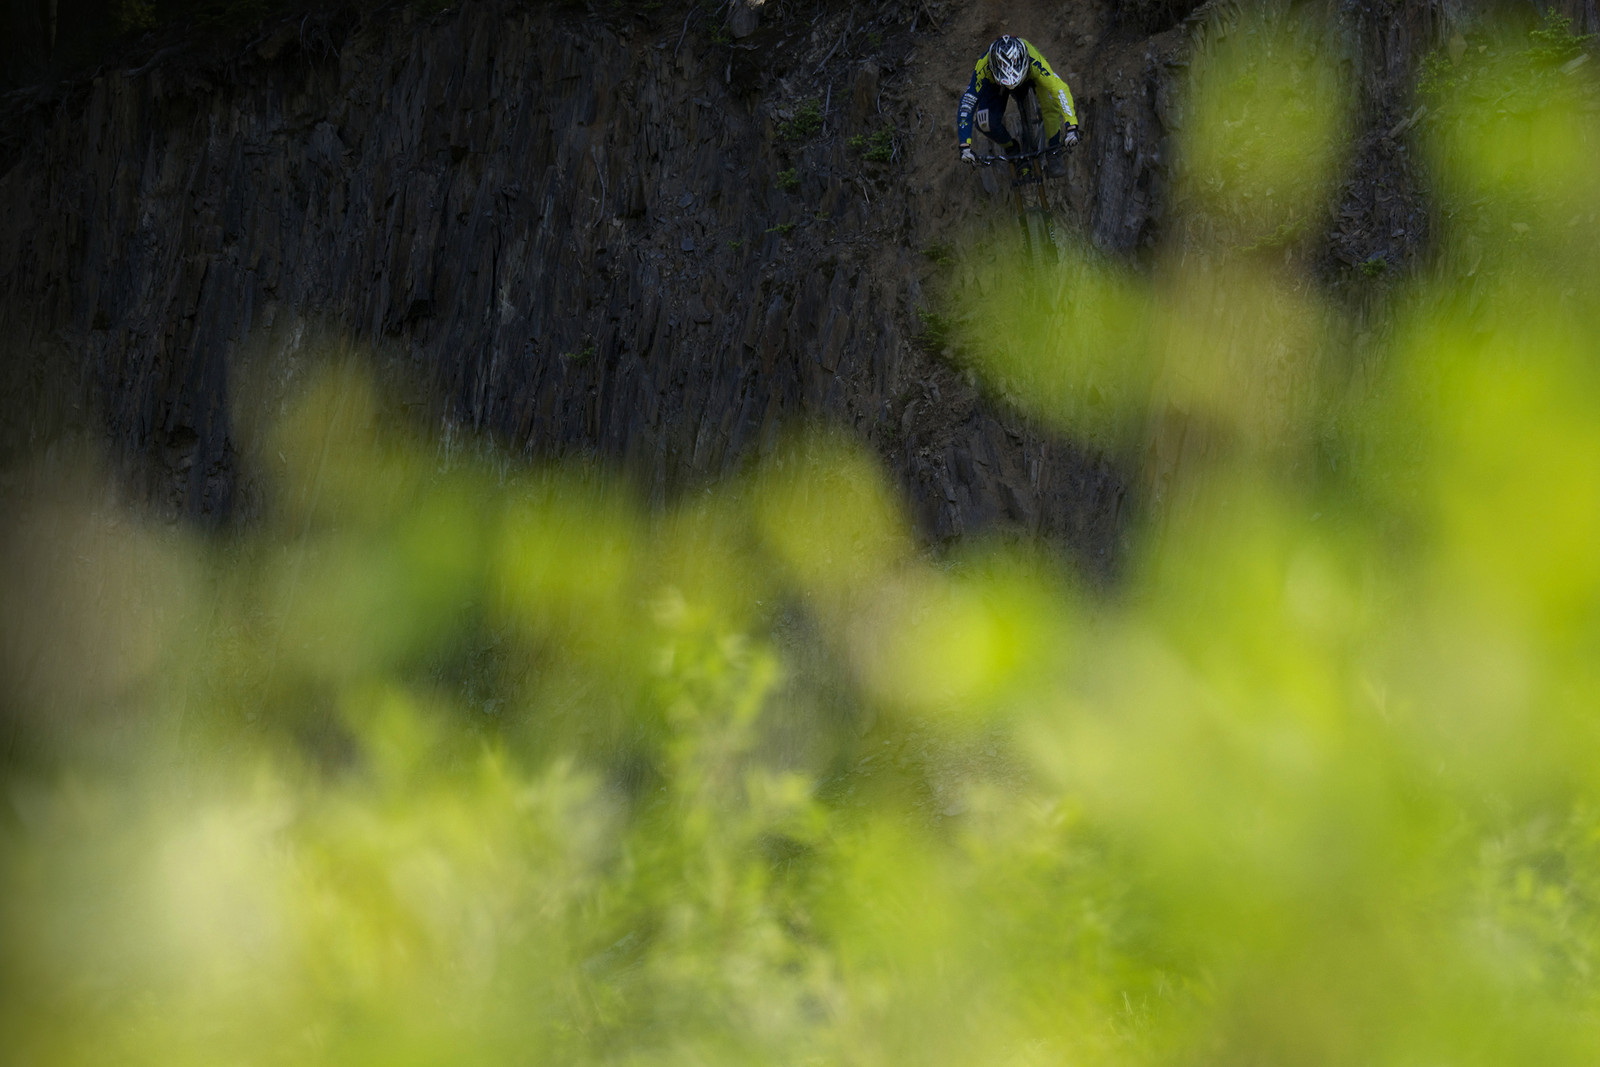 Heading Down - Dan Strangfeld - Mountain Biking Pictures - Vital MTB